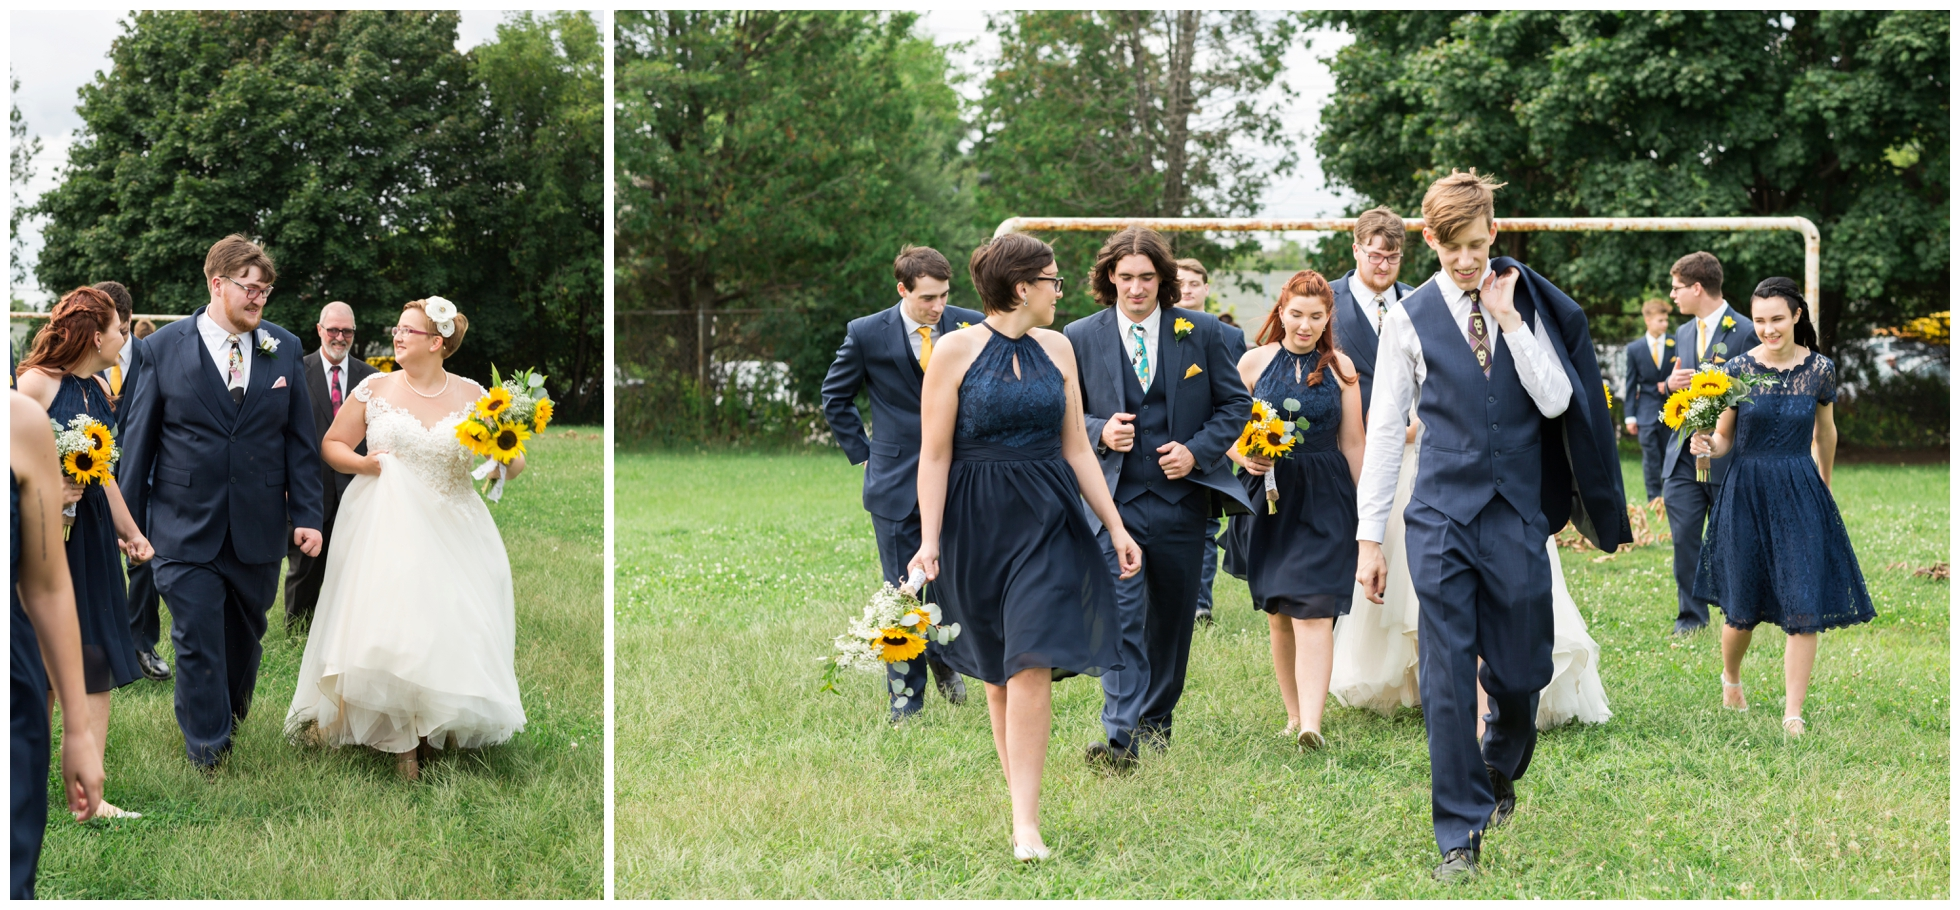 Toronto Wedding Chris Kate (Selena Phillips-Boyle)_0007.jpg